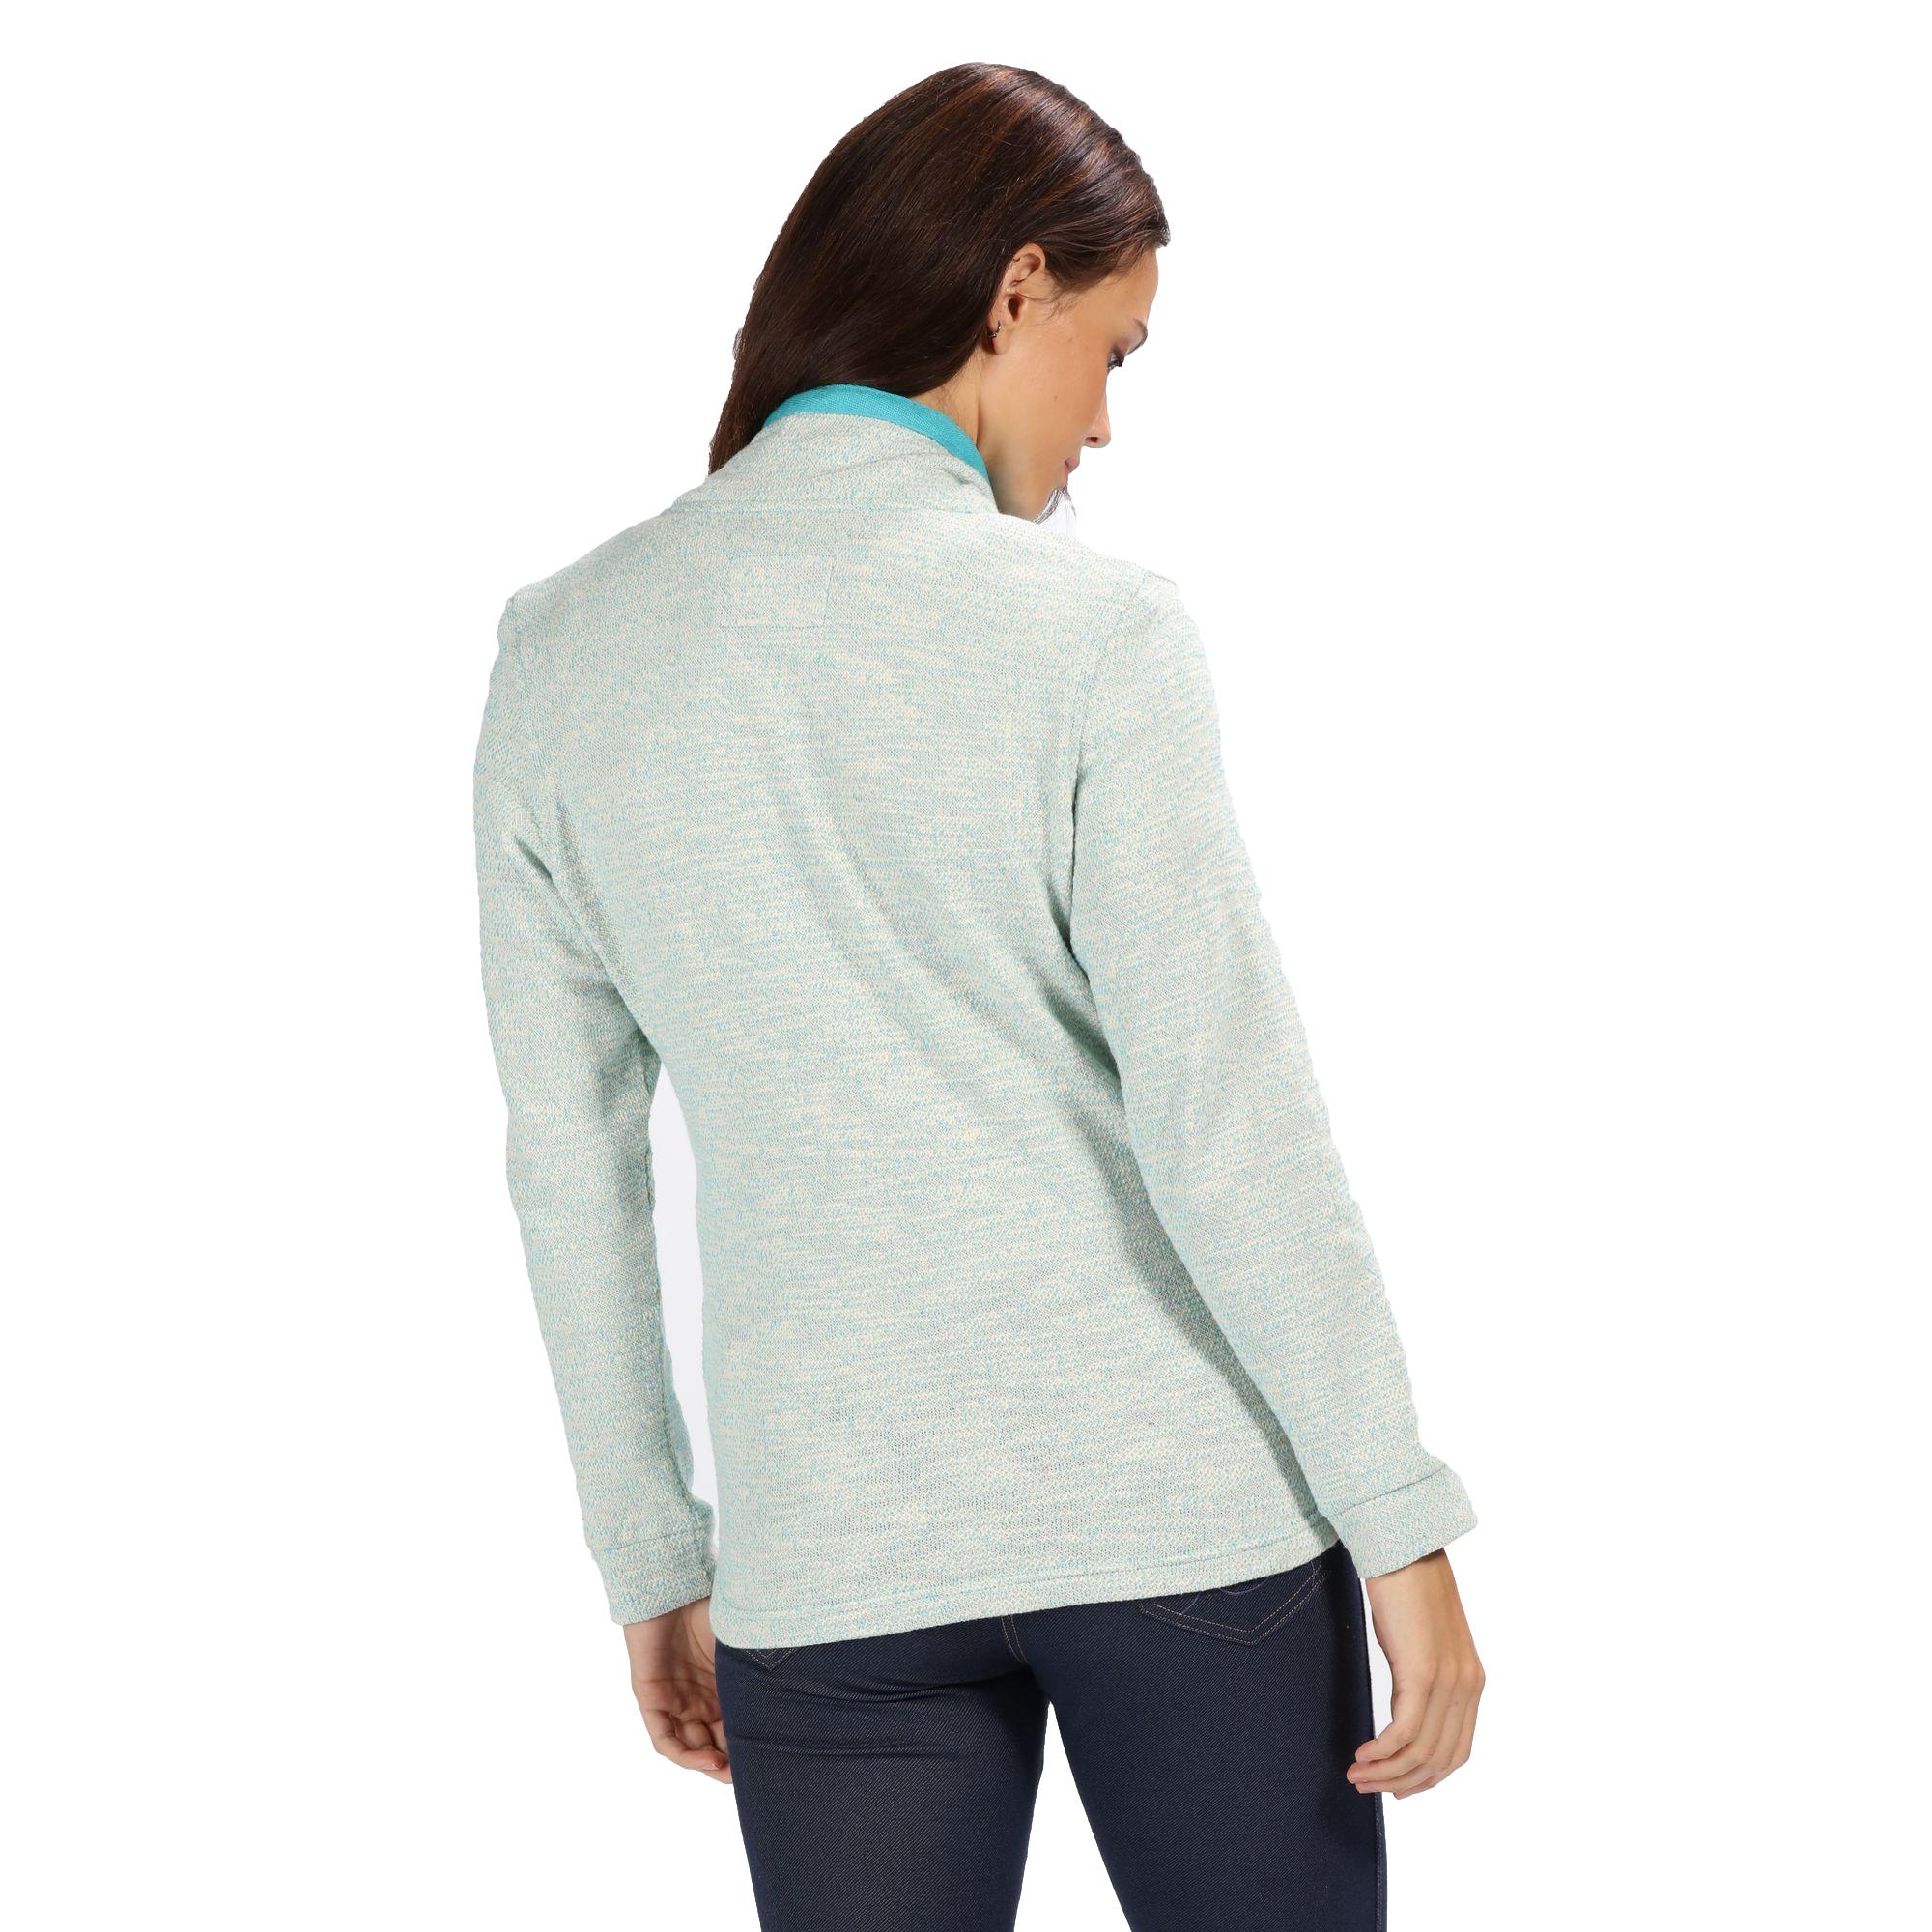 Regatta-Odetta-Womens-Warm-Curved-Full-Zip-Fleece-Jacket-RRP-50 thumbnail 3